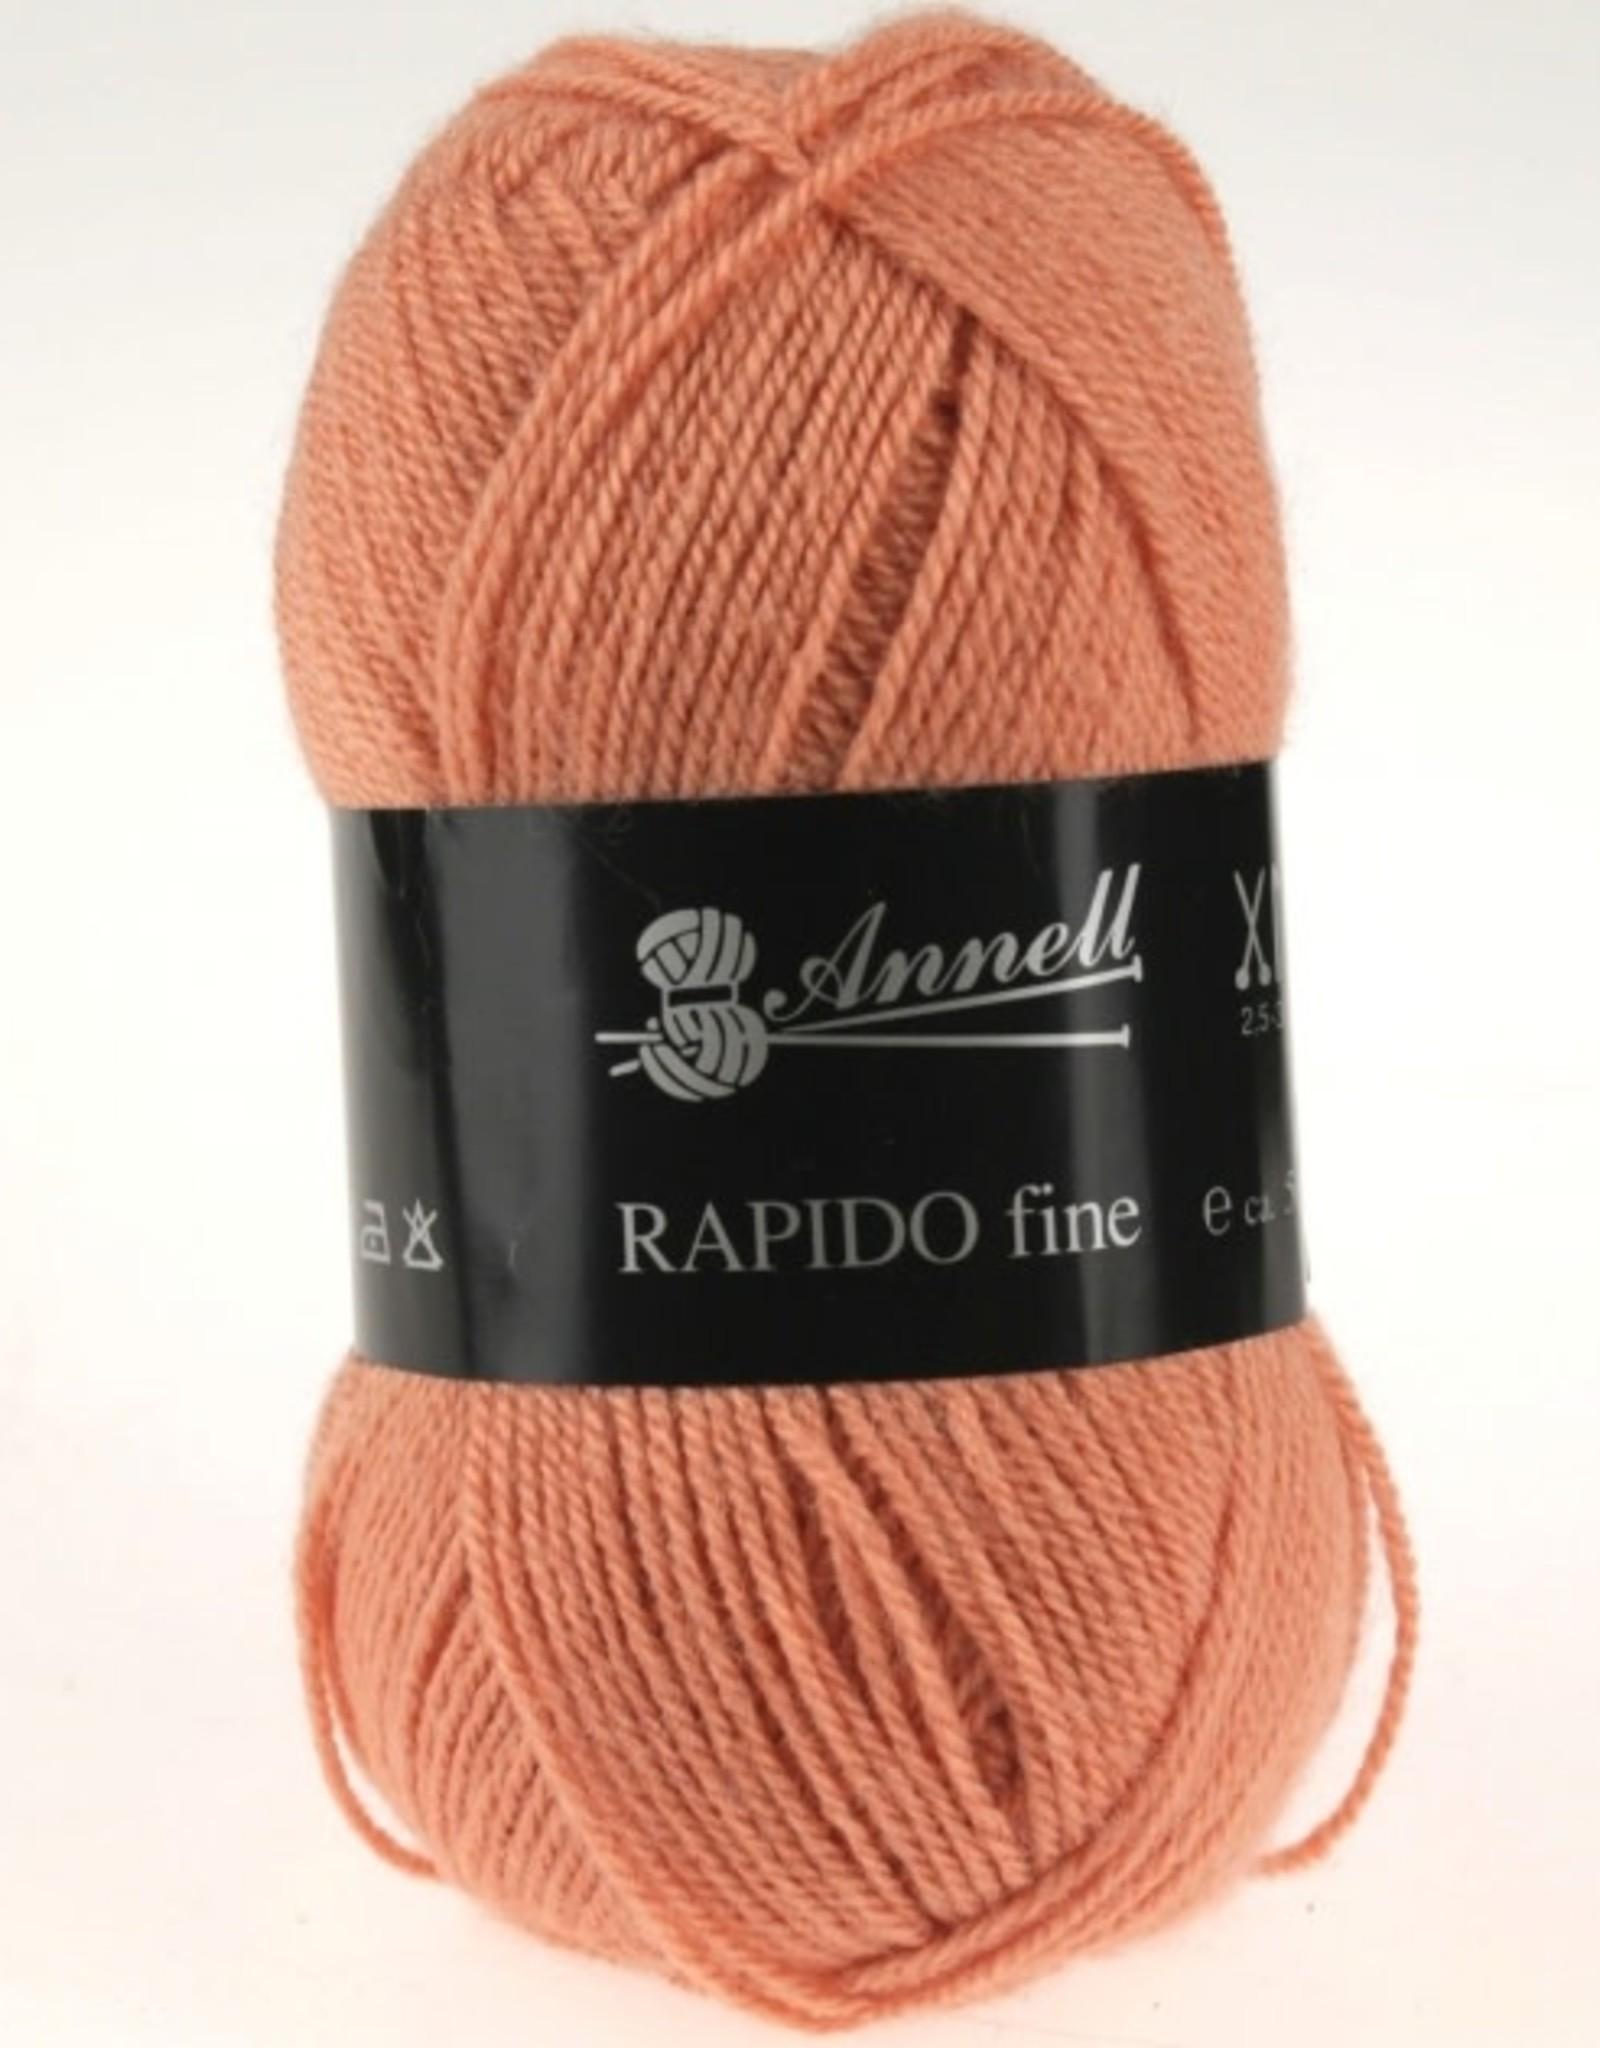 Annell Annell rapido fine 8216